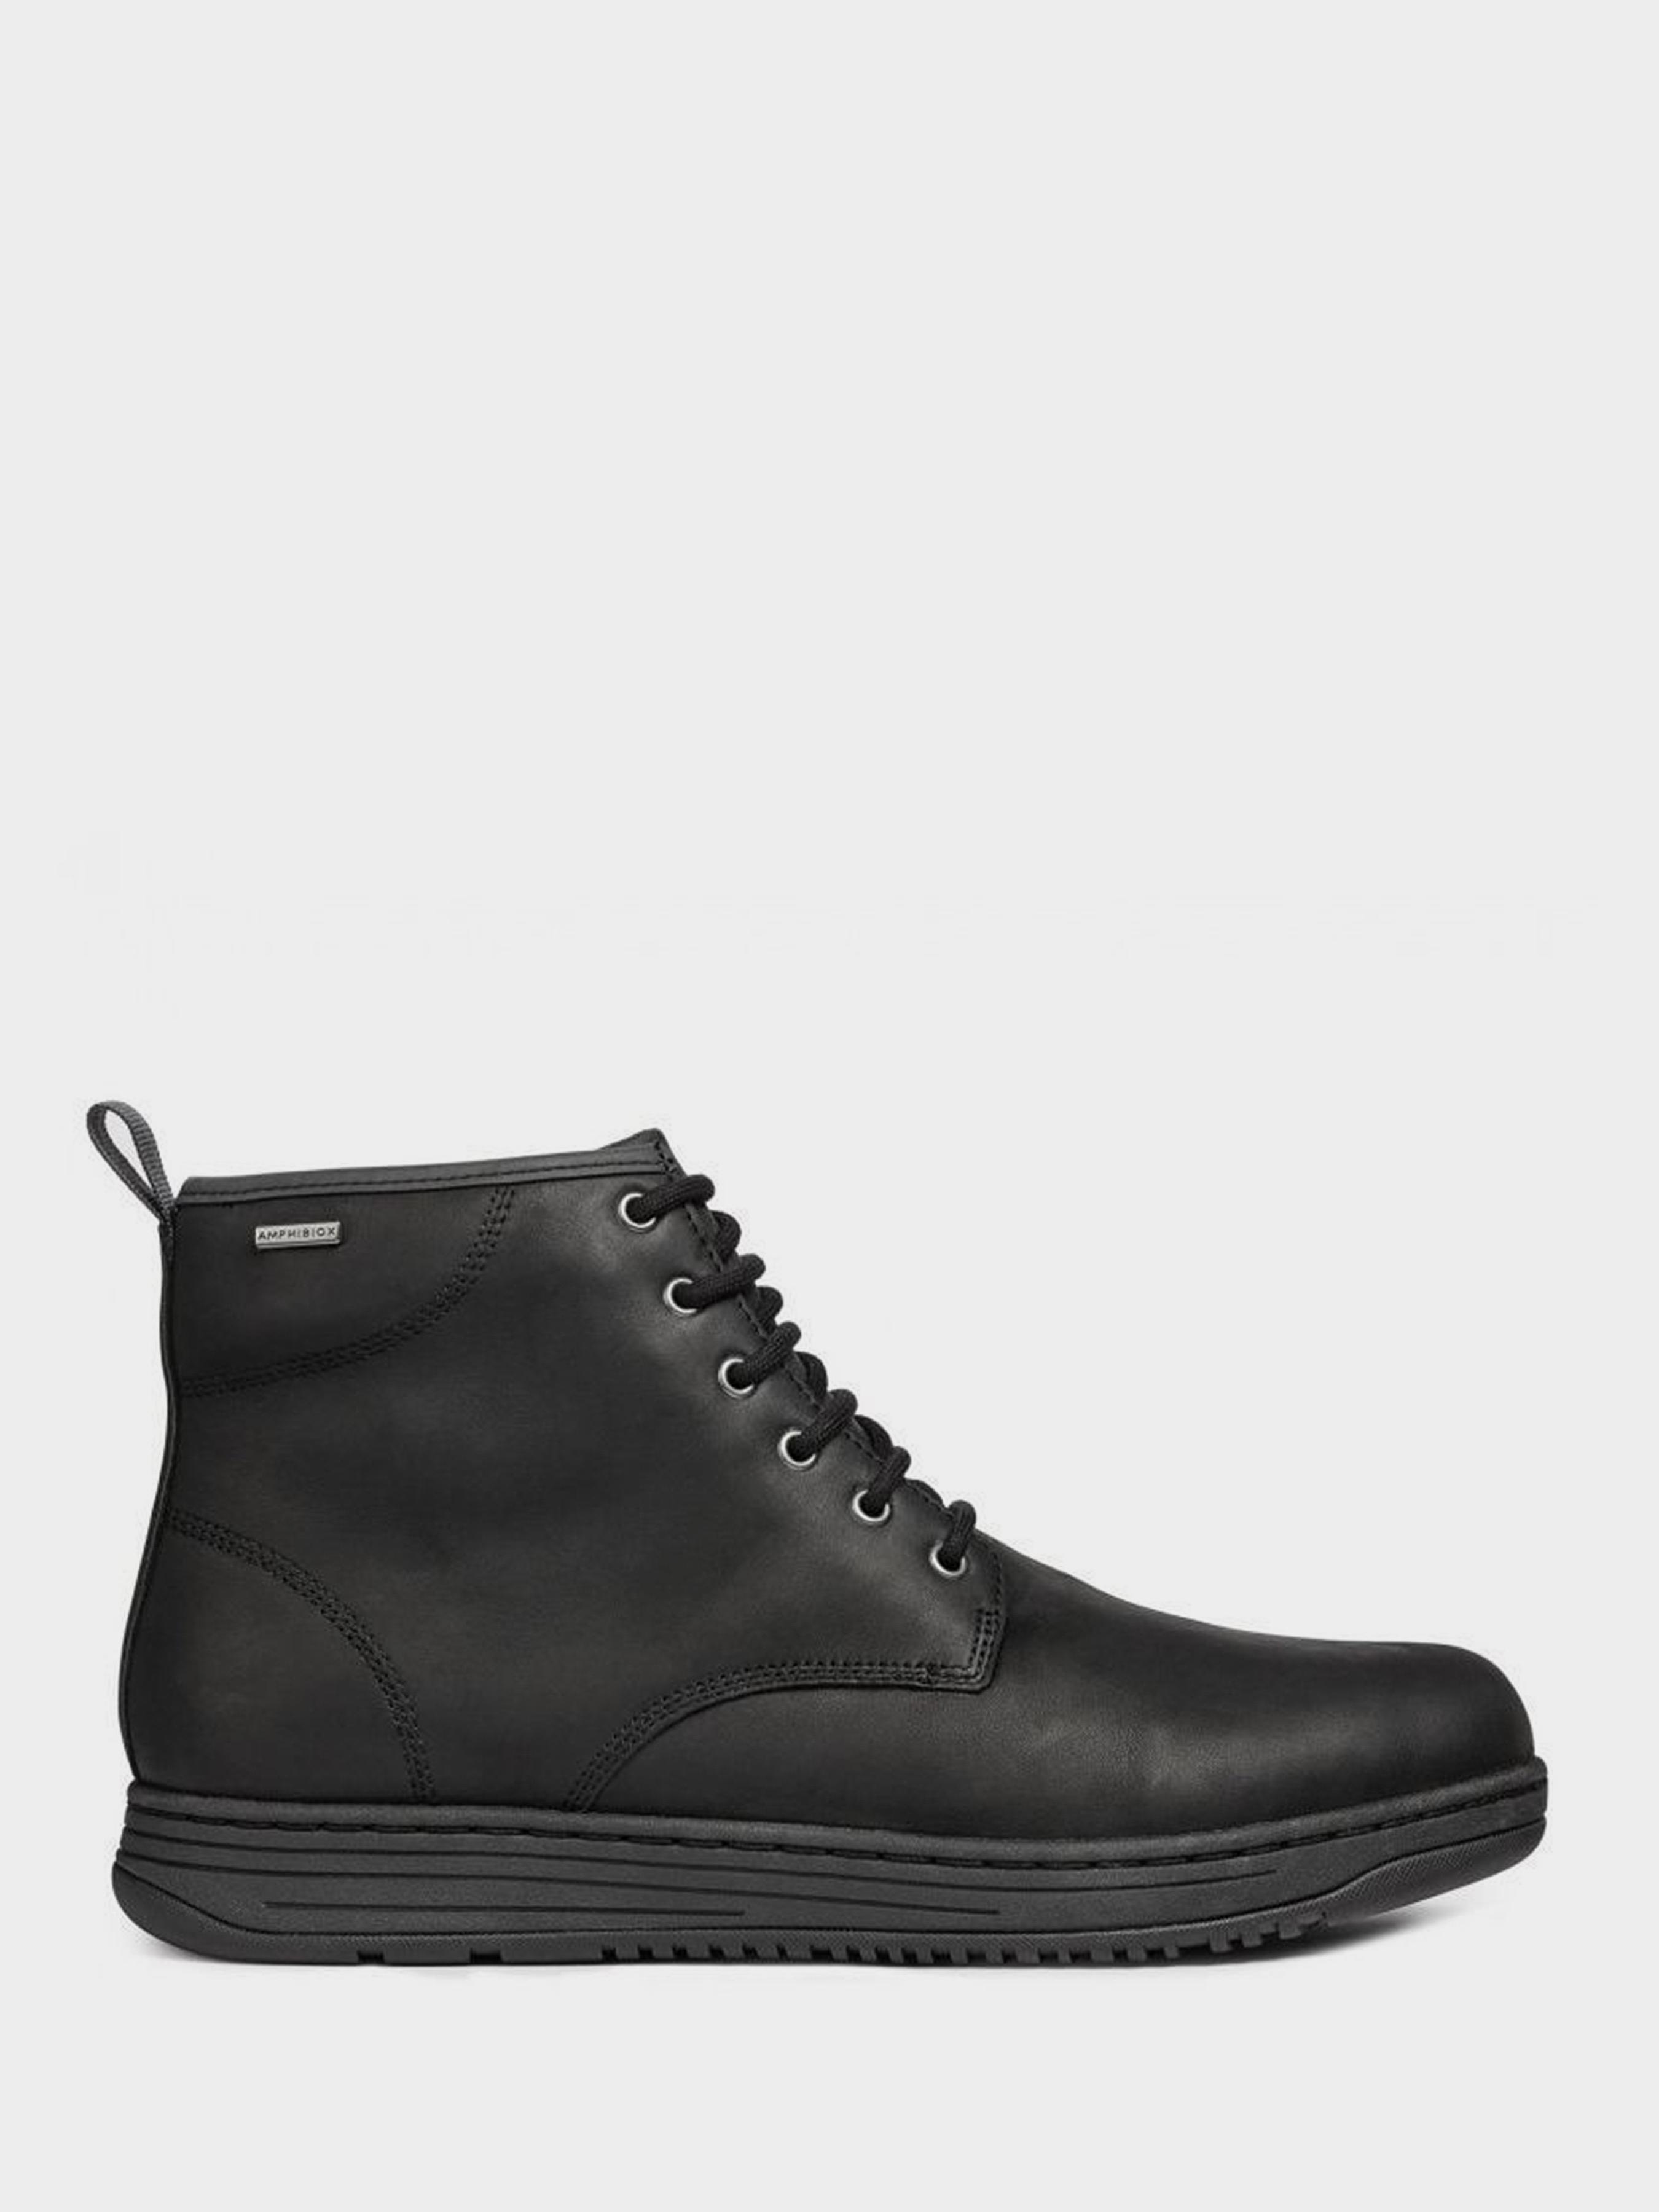 Ботинки мужские Geox ABROAB ABX XM1905 модная обувь, 2017